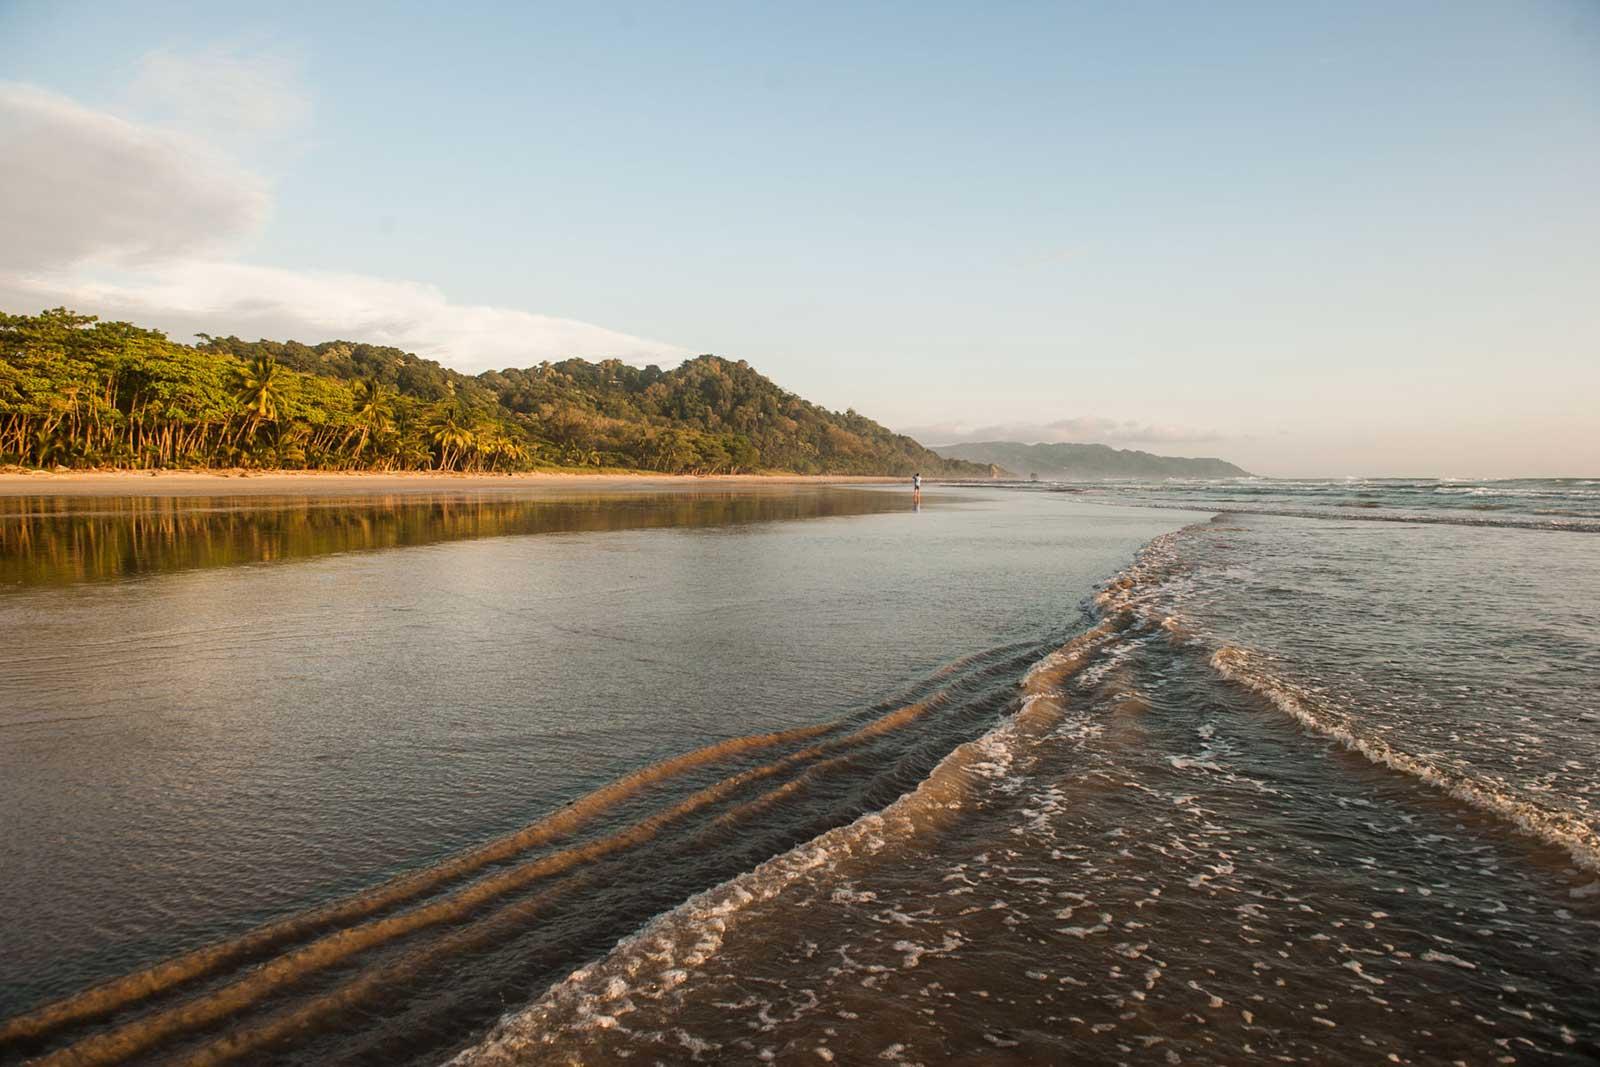 Peaks n Swells Surf Camp has an unbeatable location